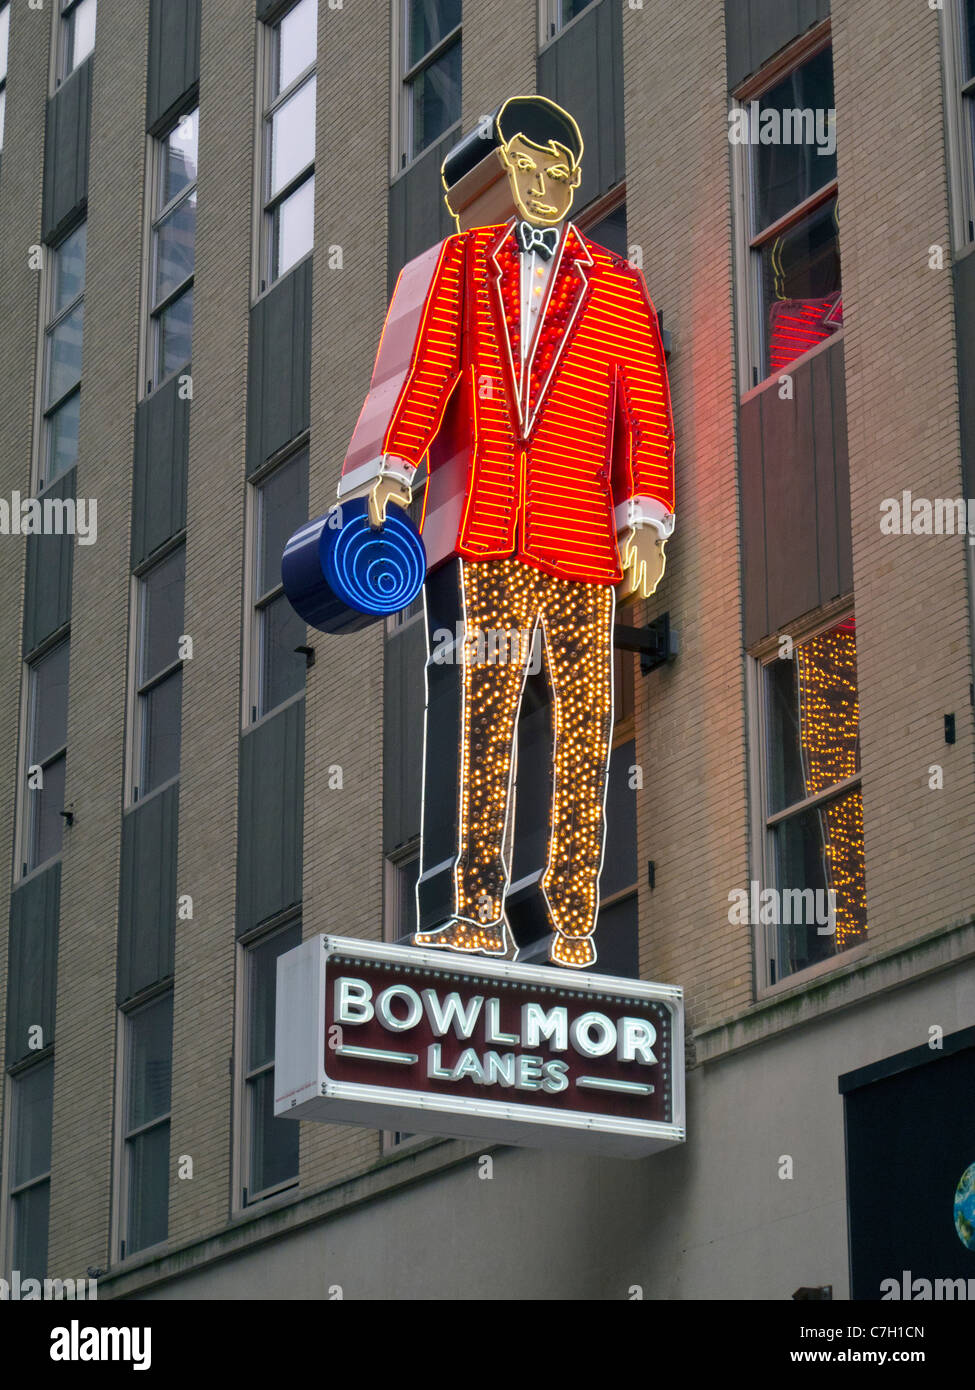 Bowlmor bowling sign - Stock Image